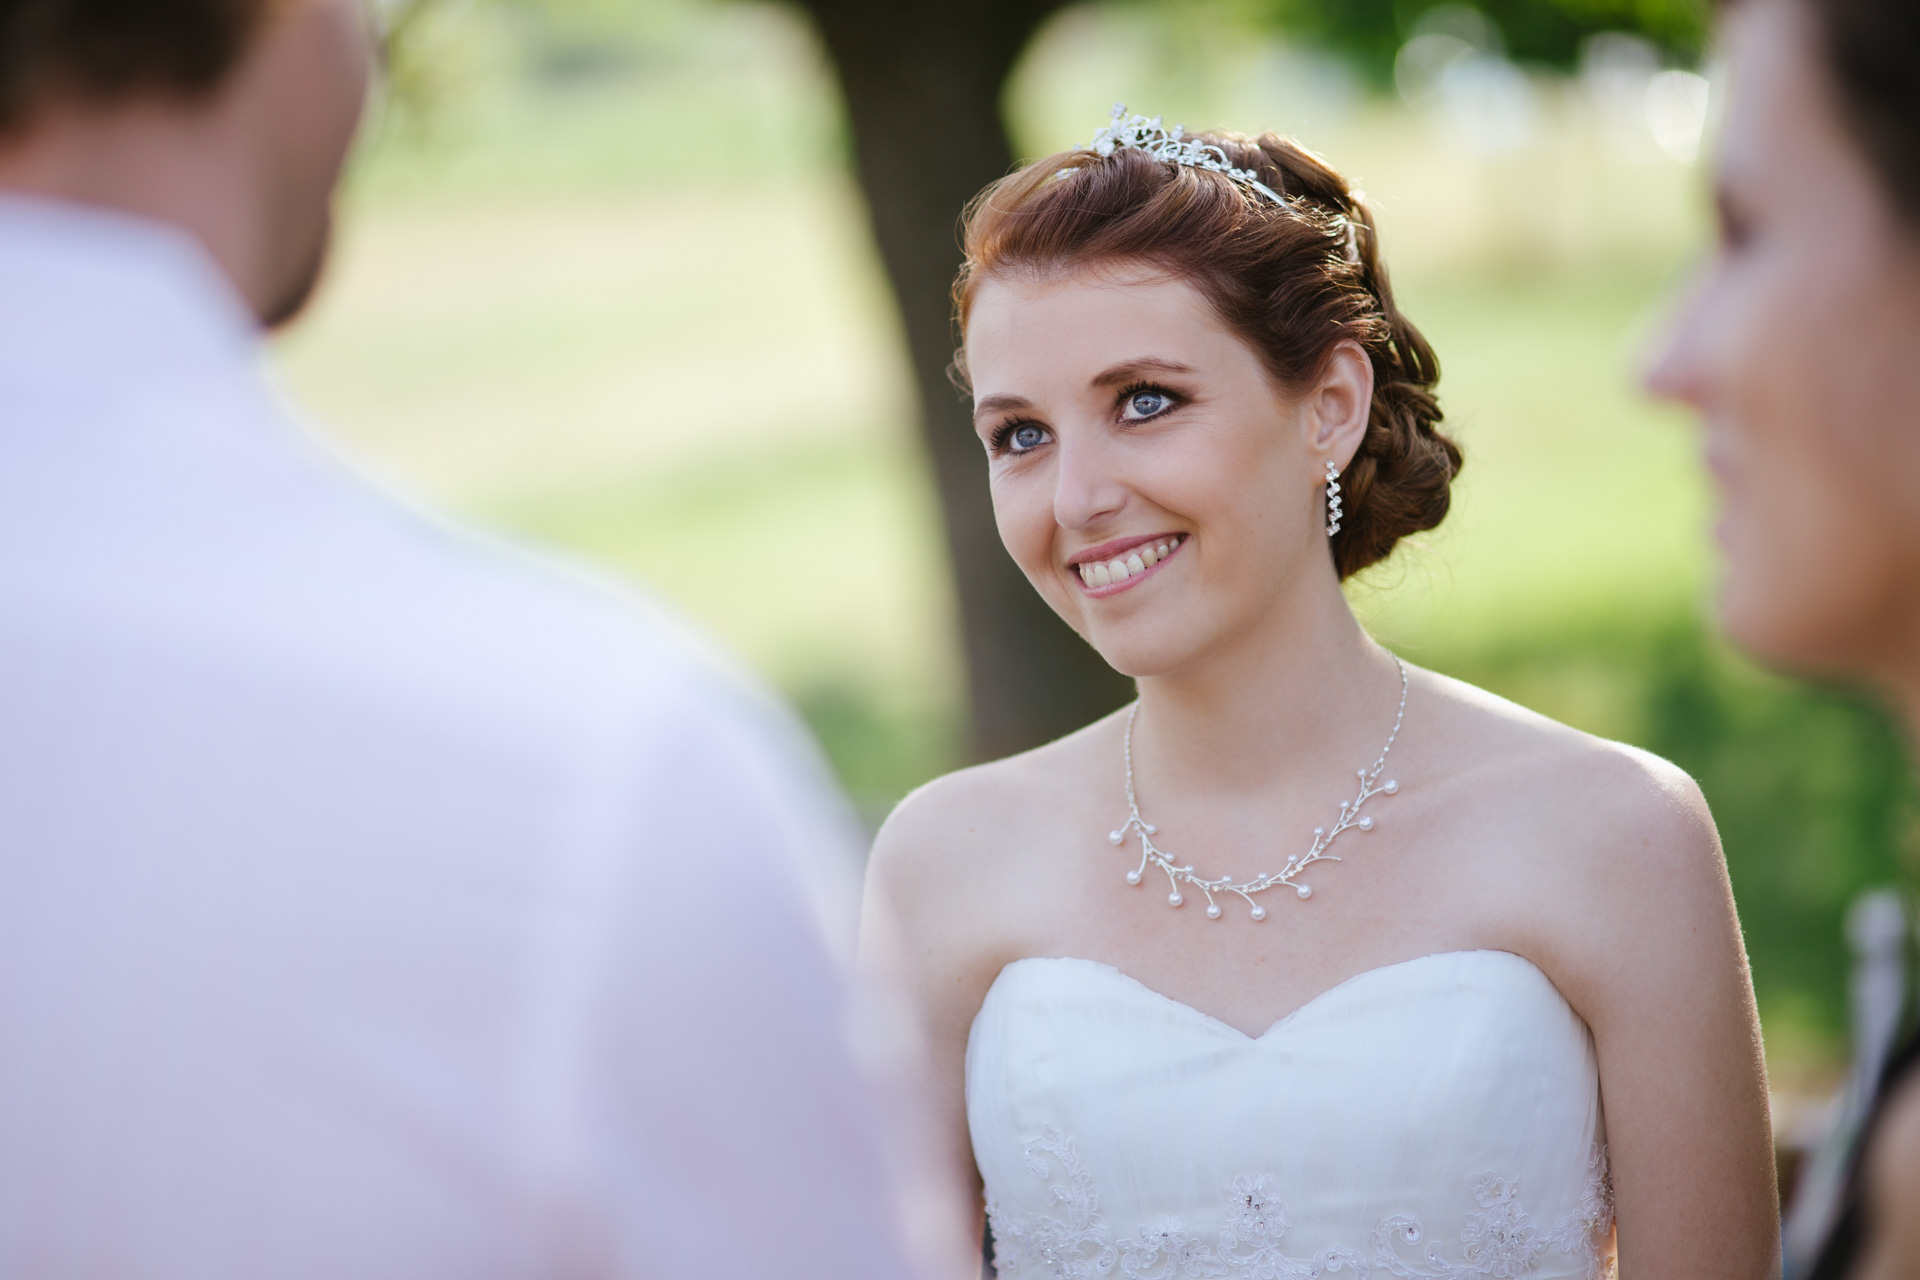 Pixelart_Hochzeitsfotografen_Loerrach_Rheinfelden_Hallwil_Schweiz_Linda-Ramon-1042